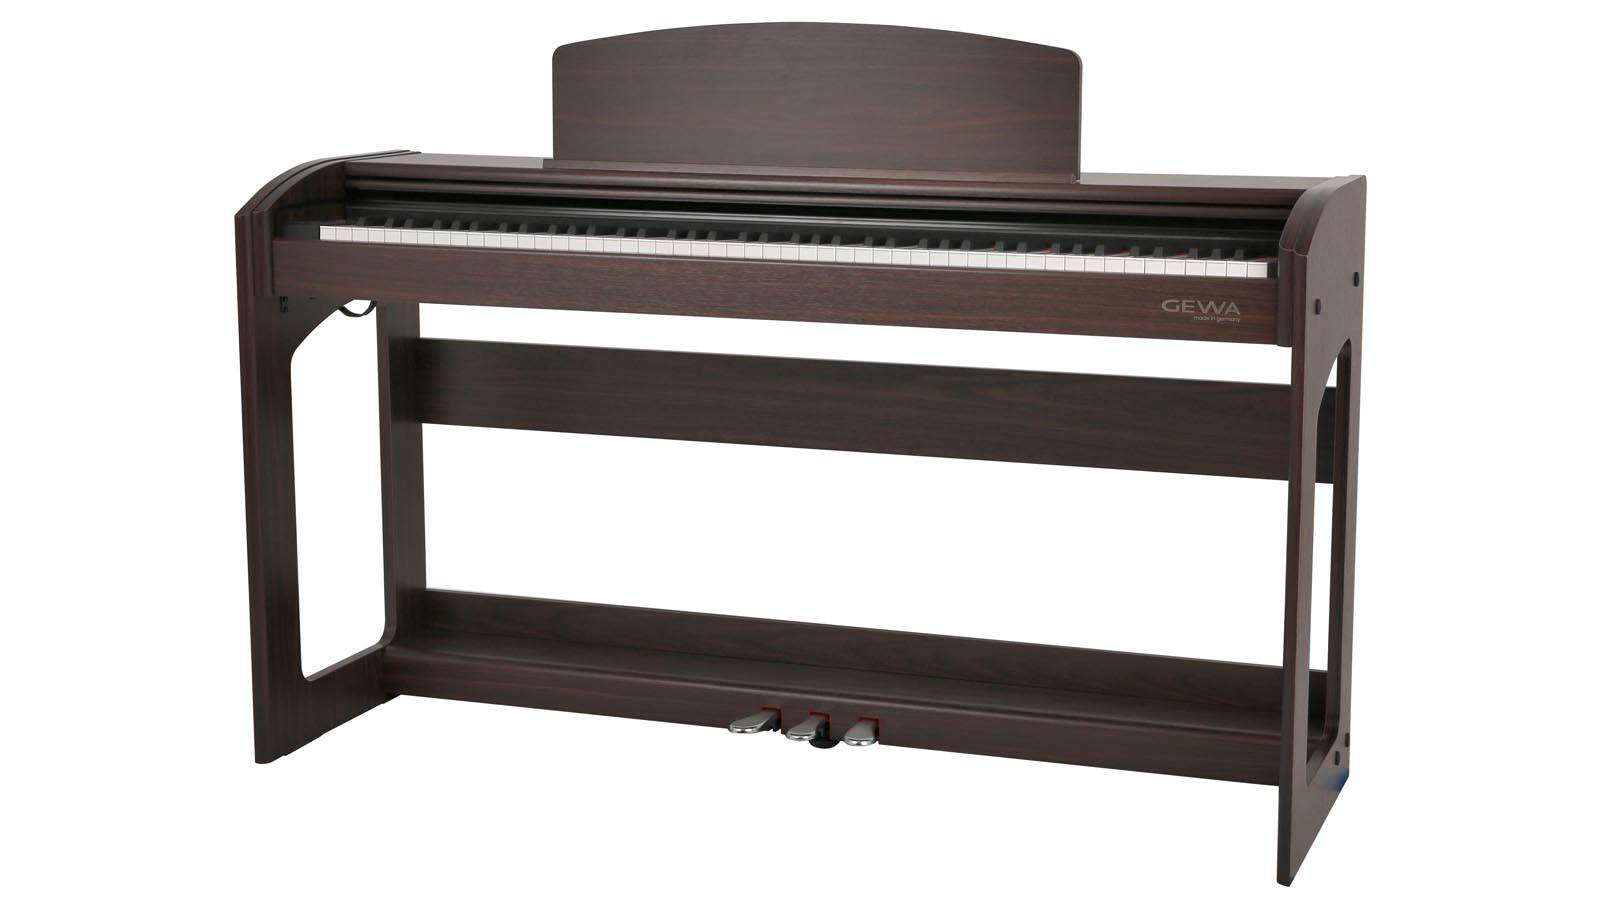 Gewa DP340G RW E-Piano rosewood matt